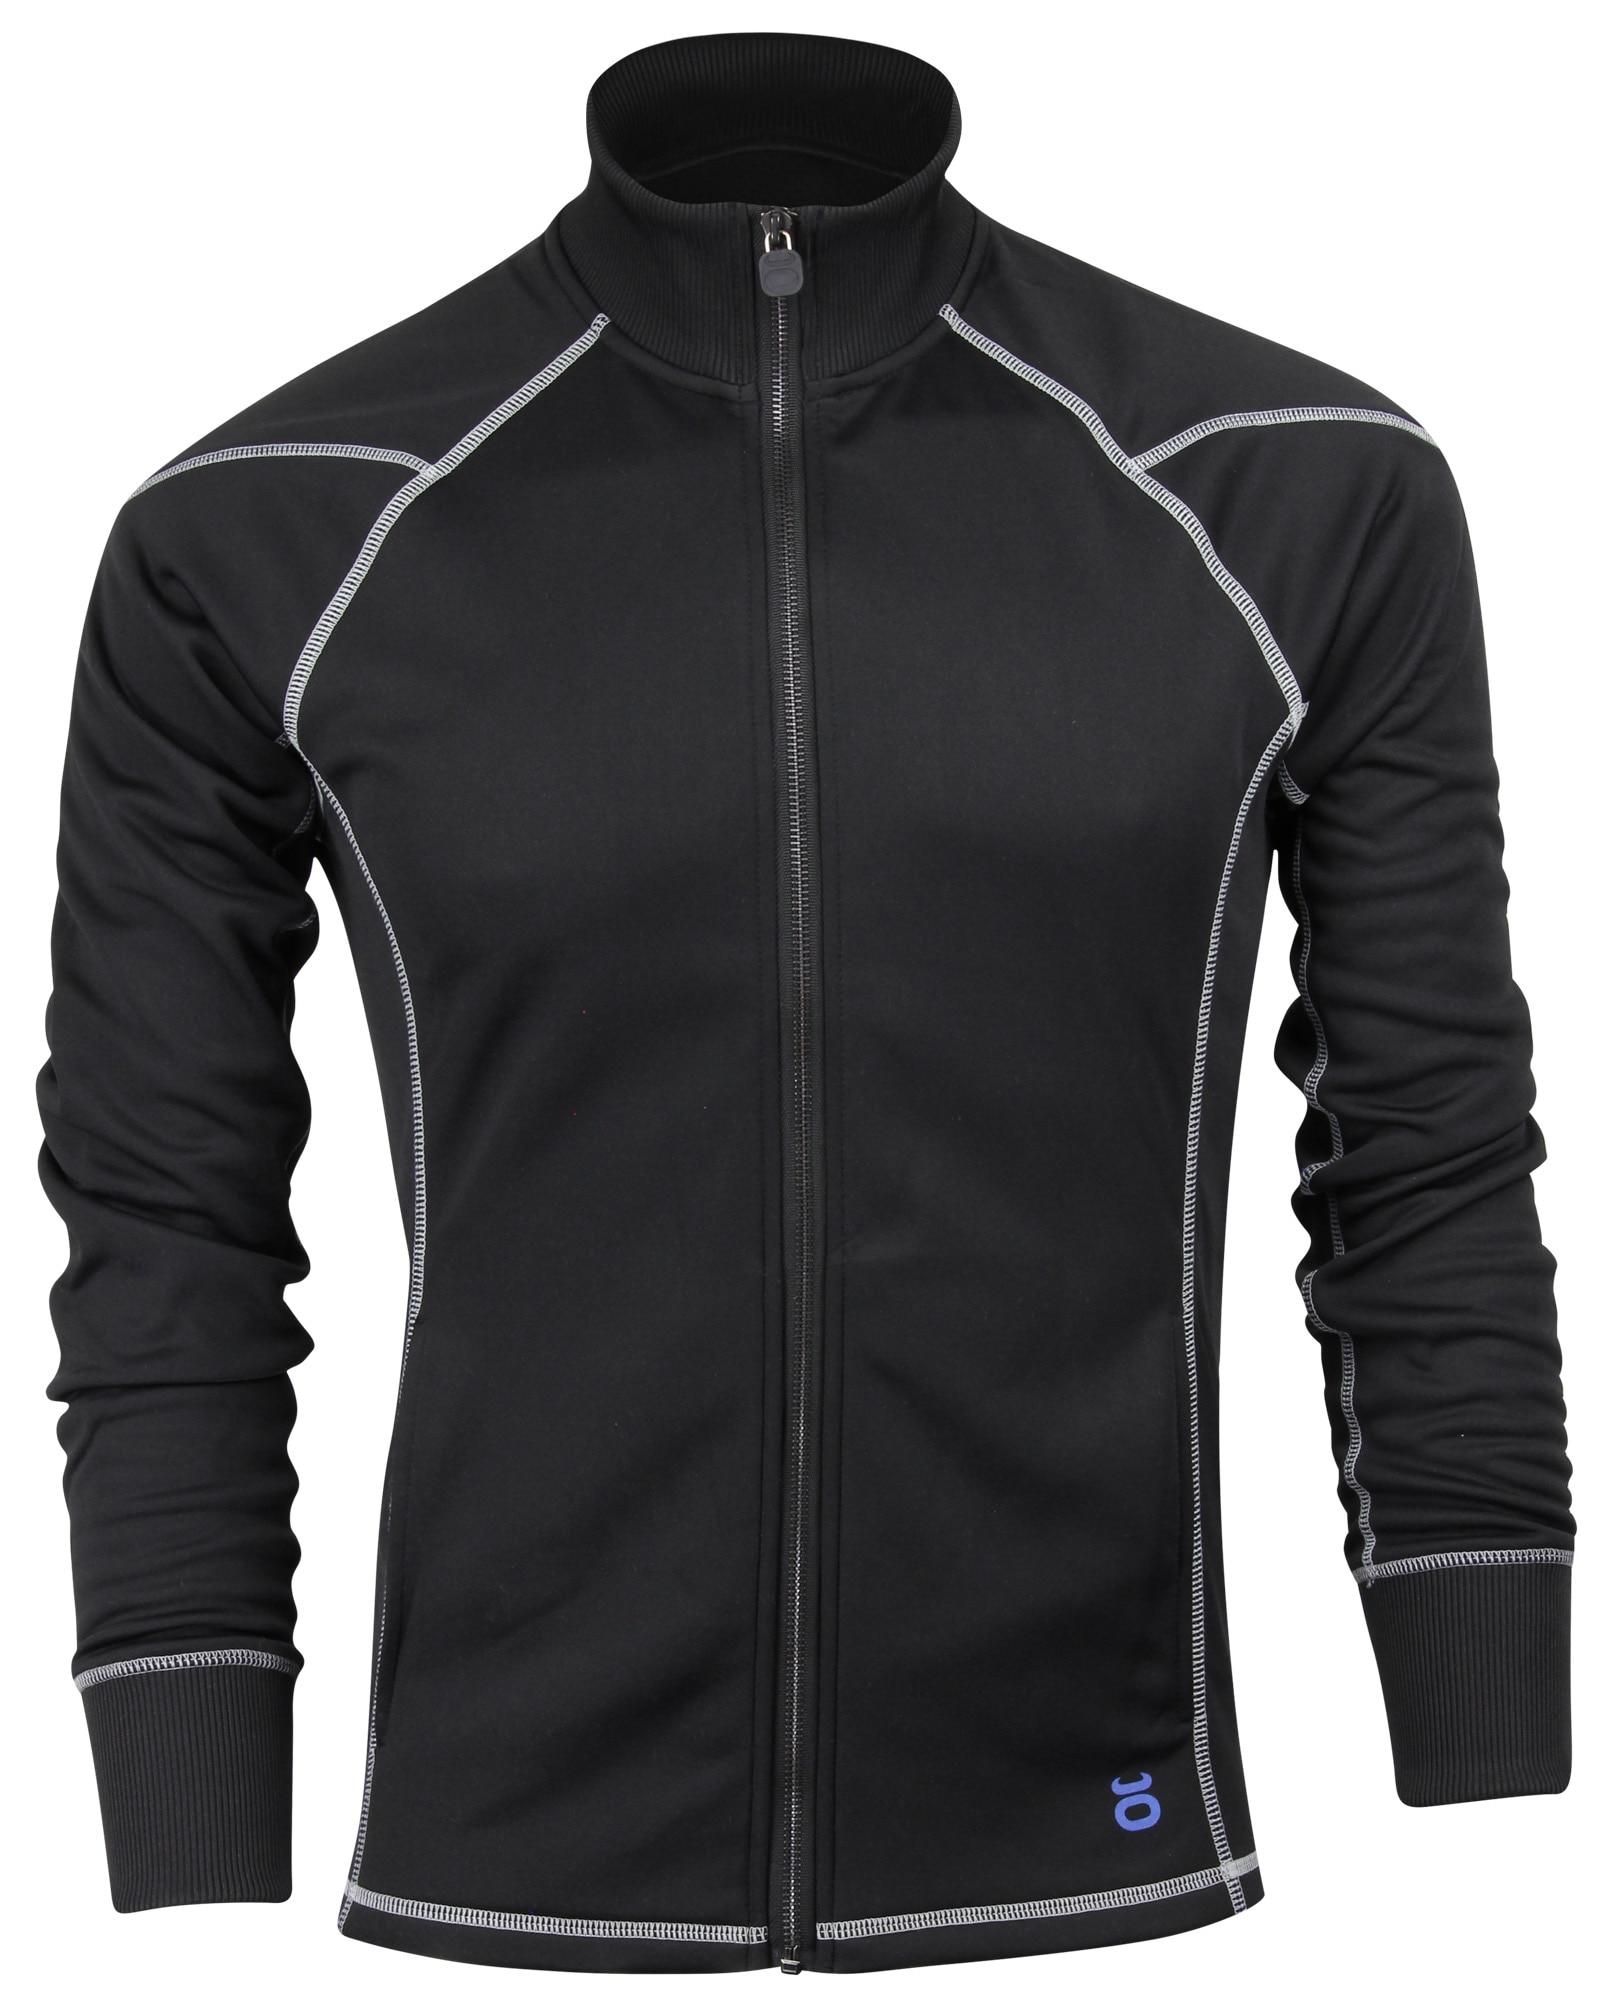 e061309a968e8 Jaco Training Performance Jacket (Black Gray)